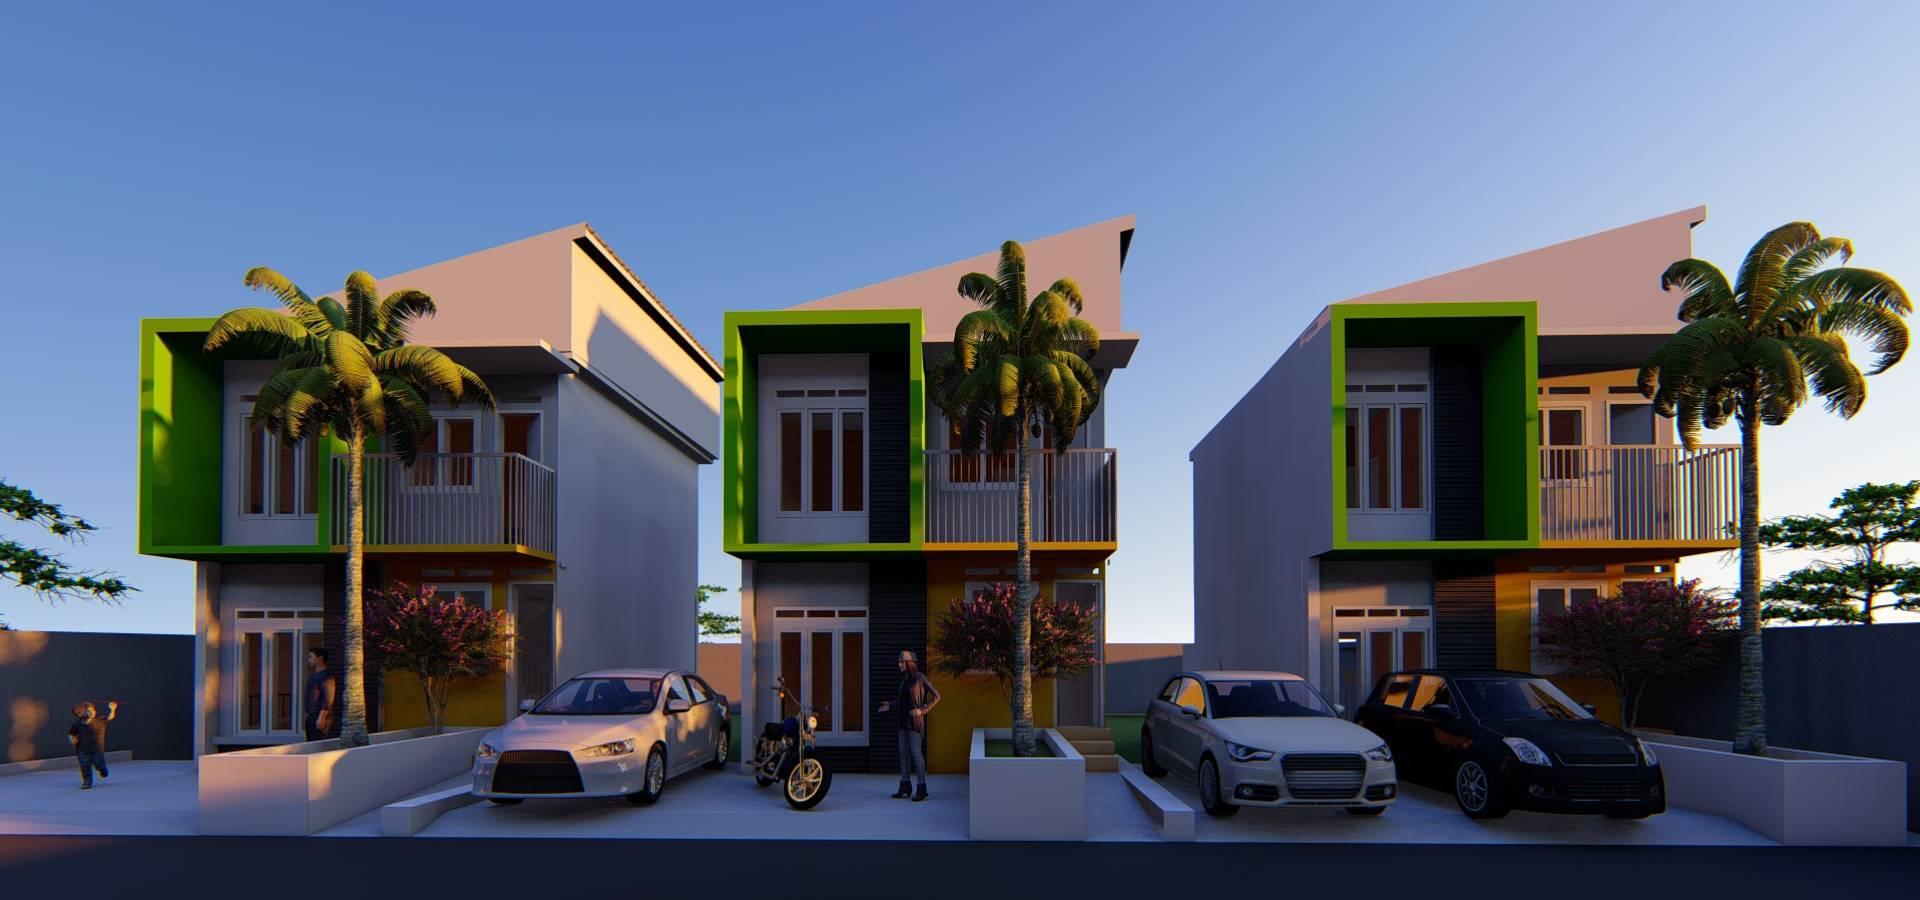 Fastetika Architecture